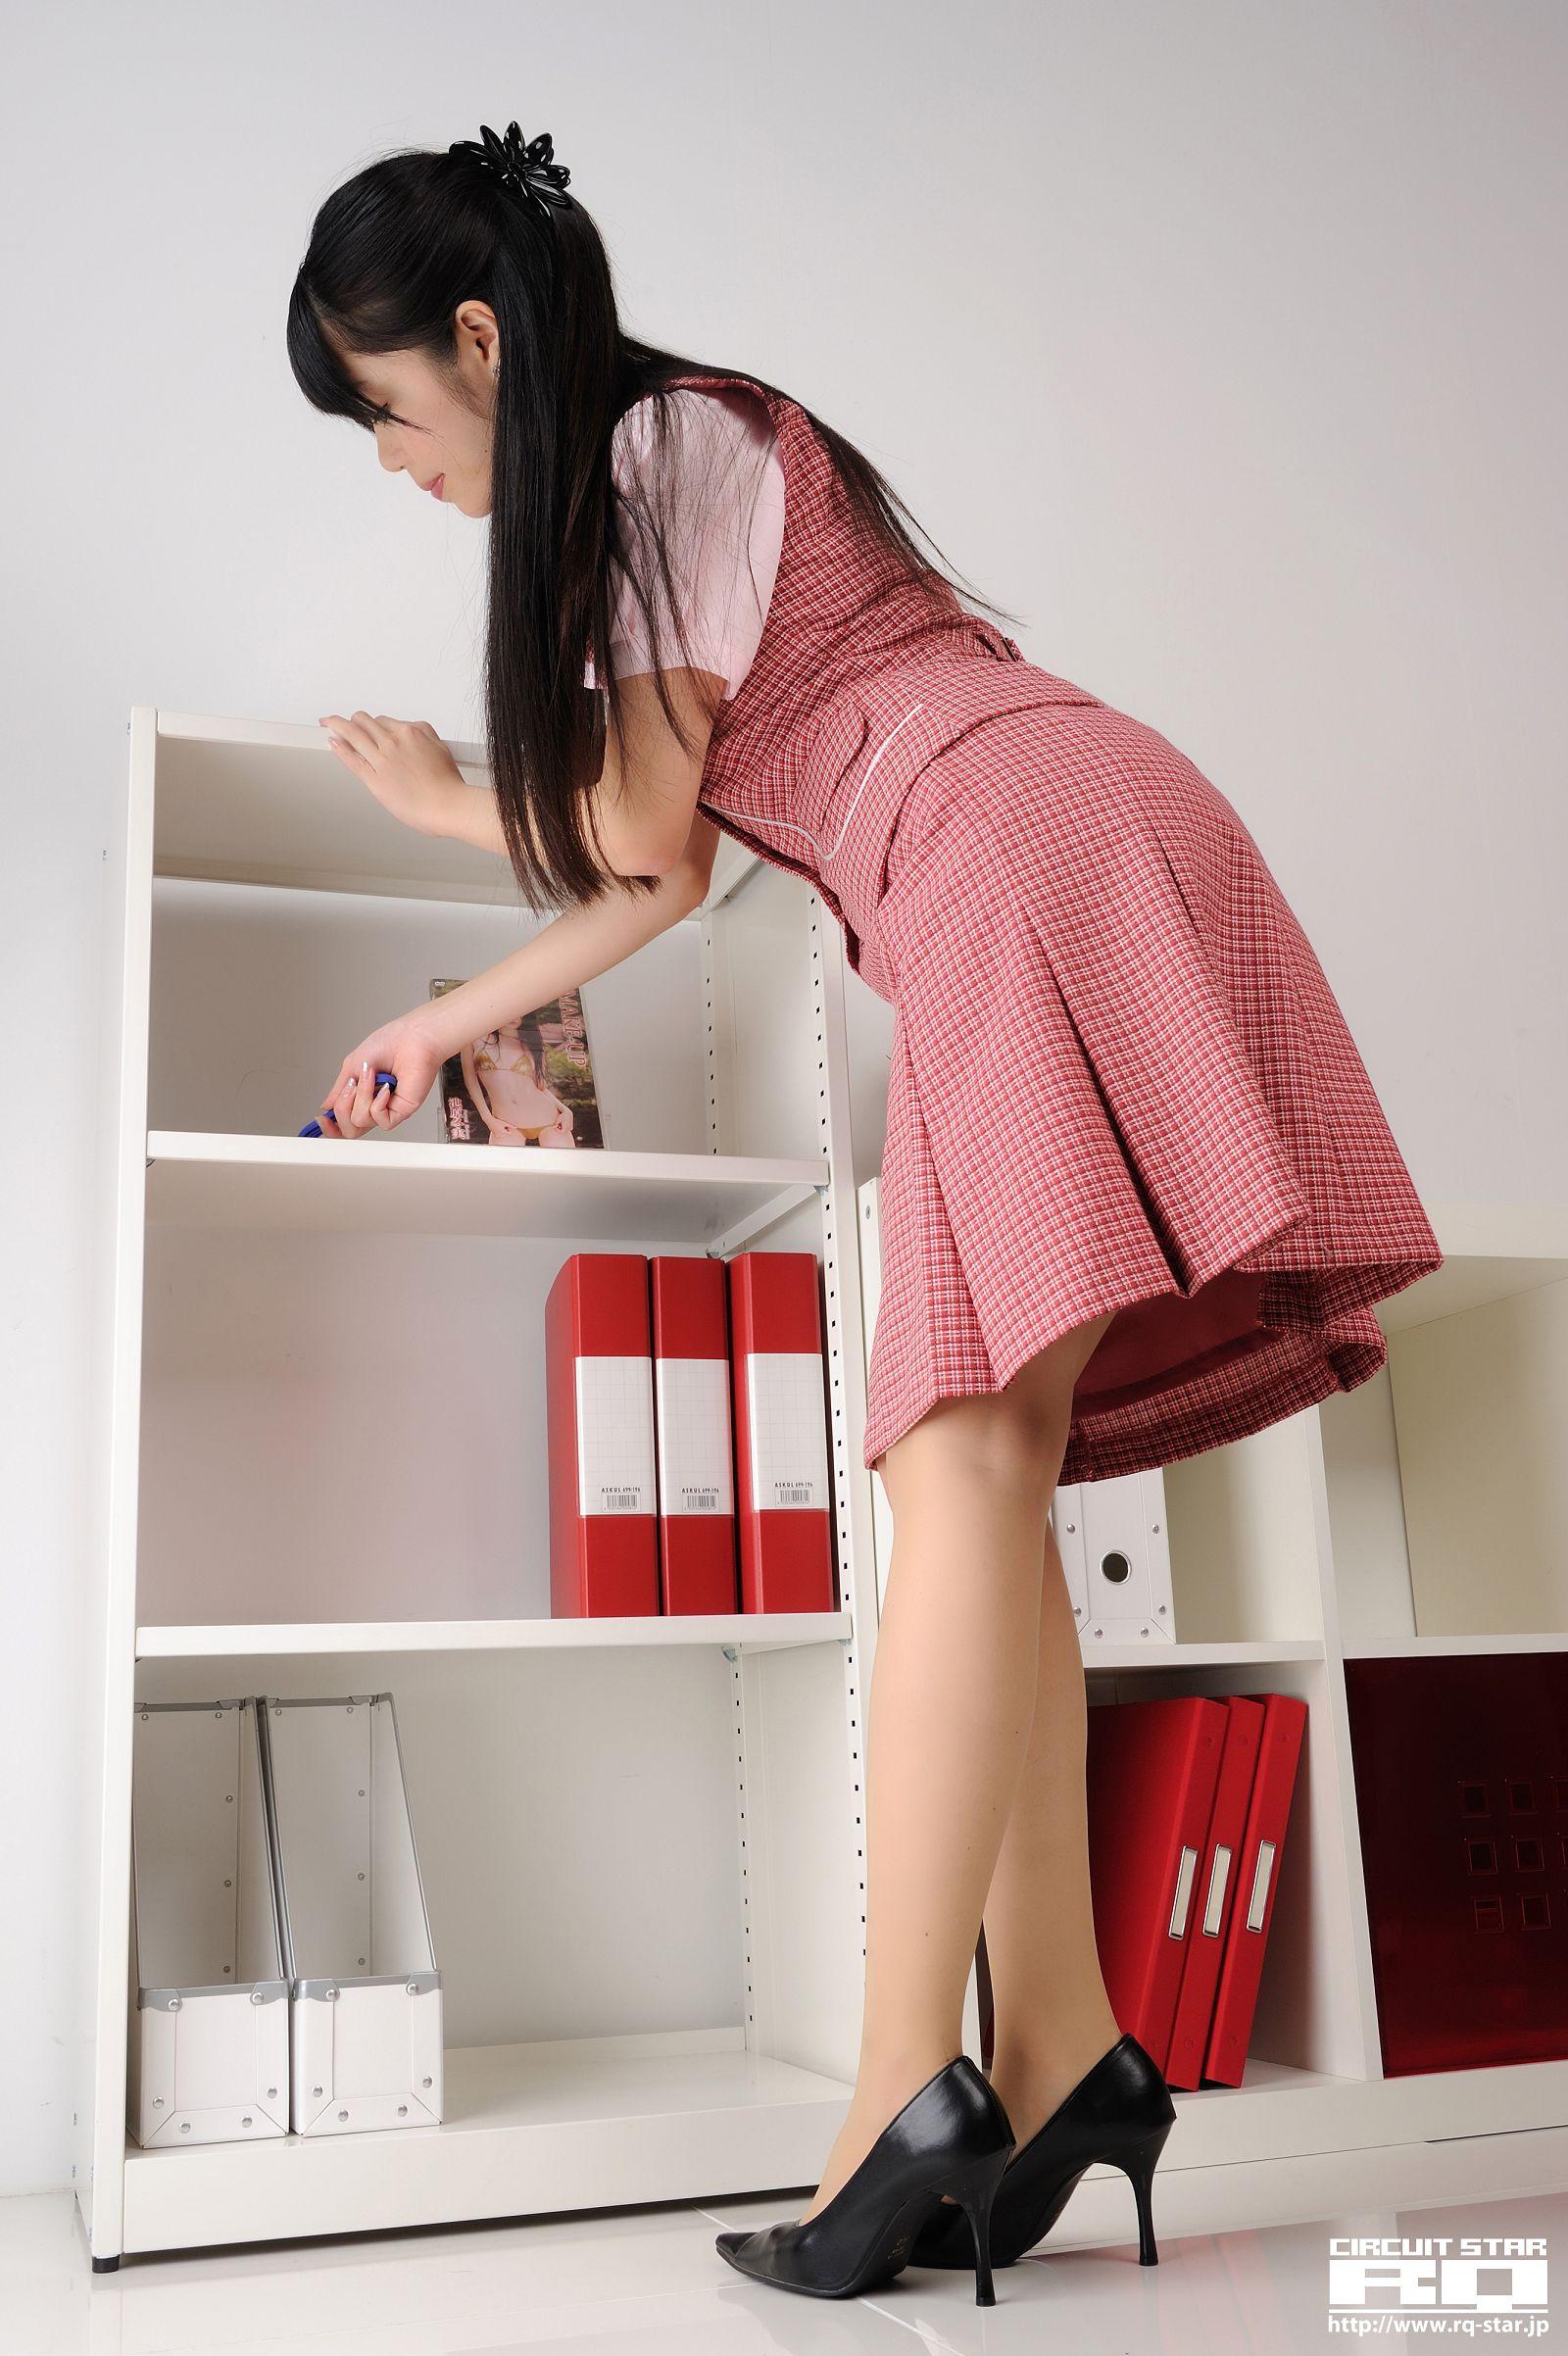 [RQ STAR美女] NO.0431 Fuyumi Ikehara 池原冬実 Office Lady[74P] RQ STAR 第2张